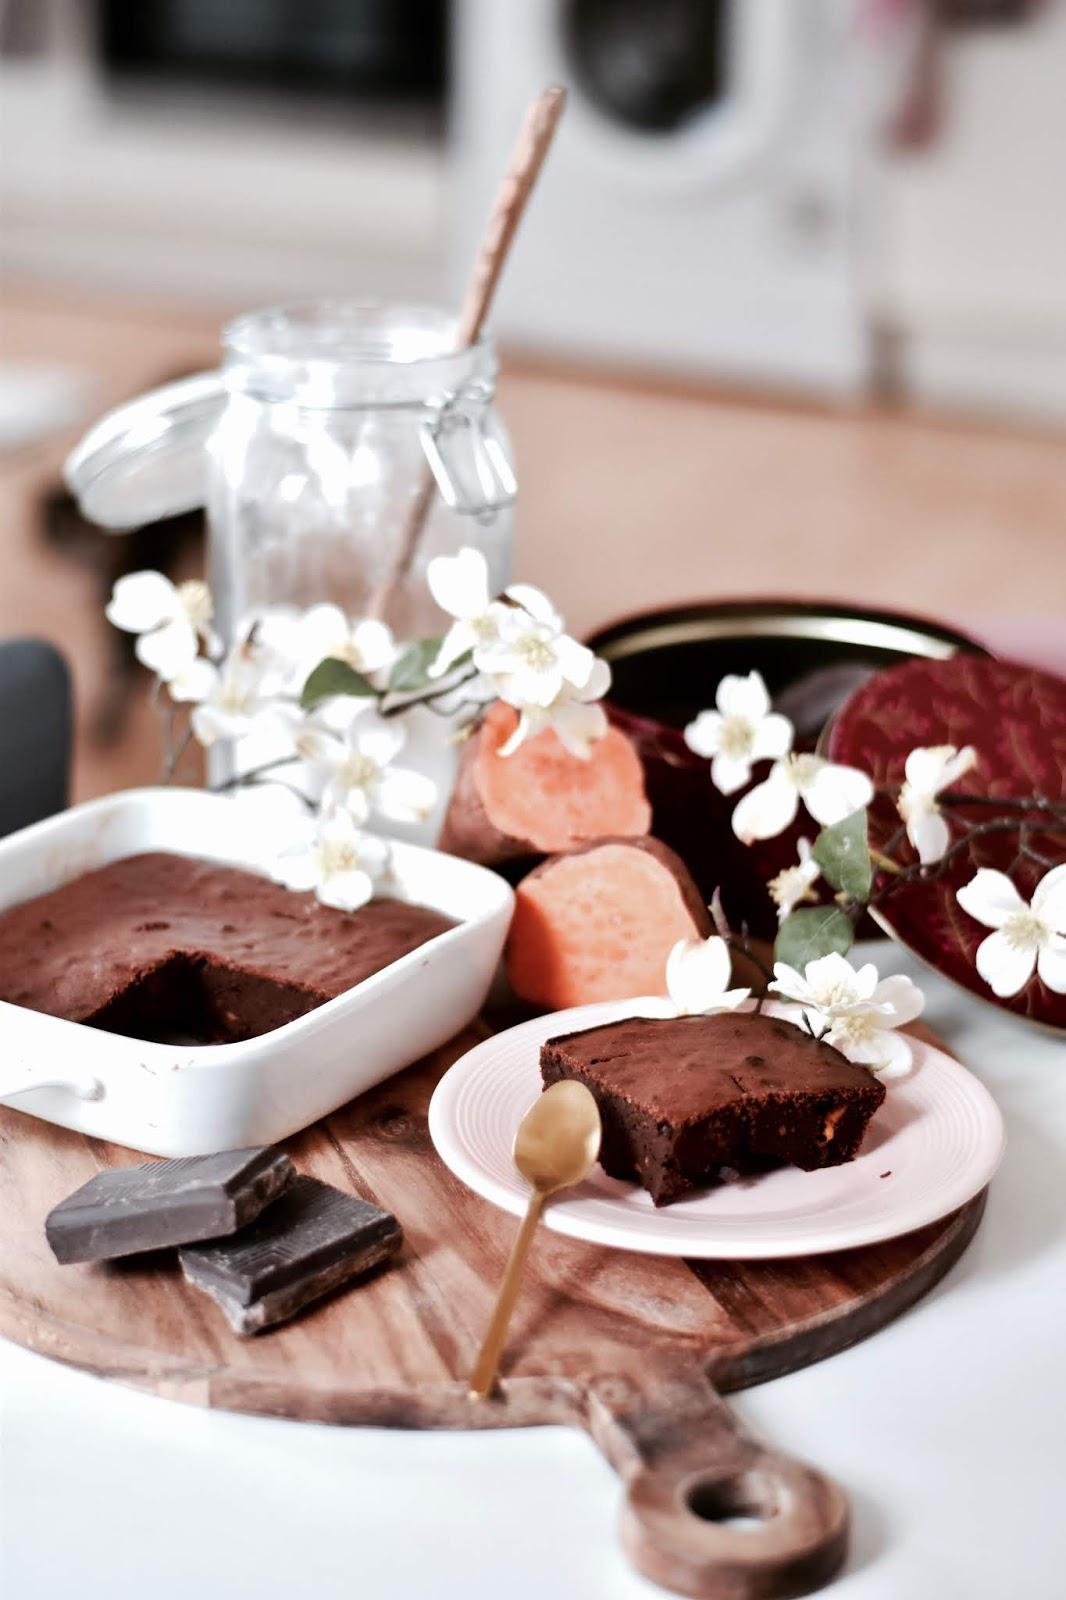 recette facile : gâteau au chocolat et à la patate douce